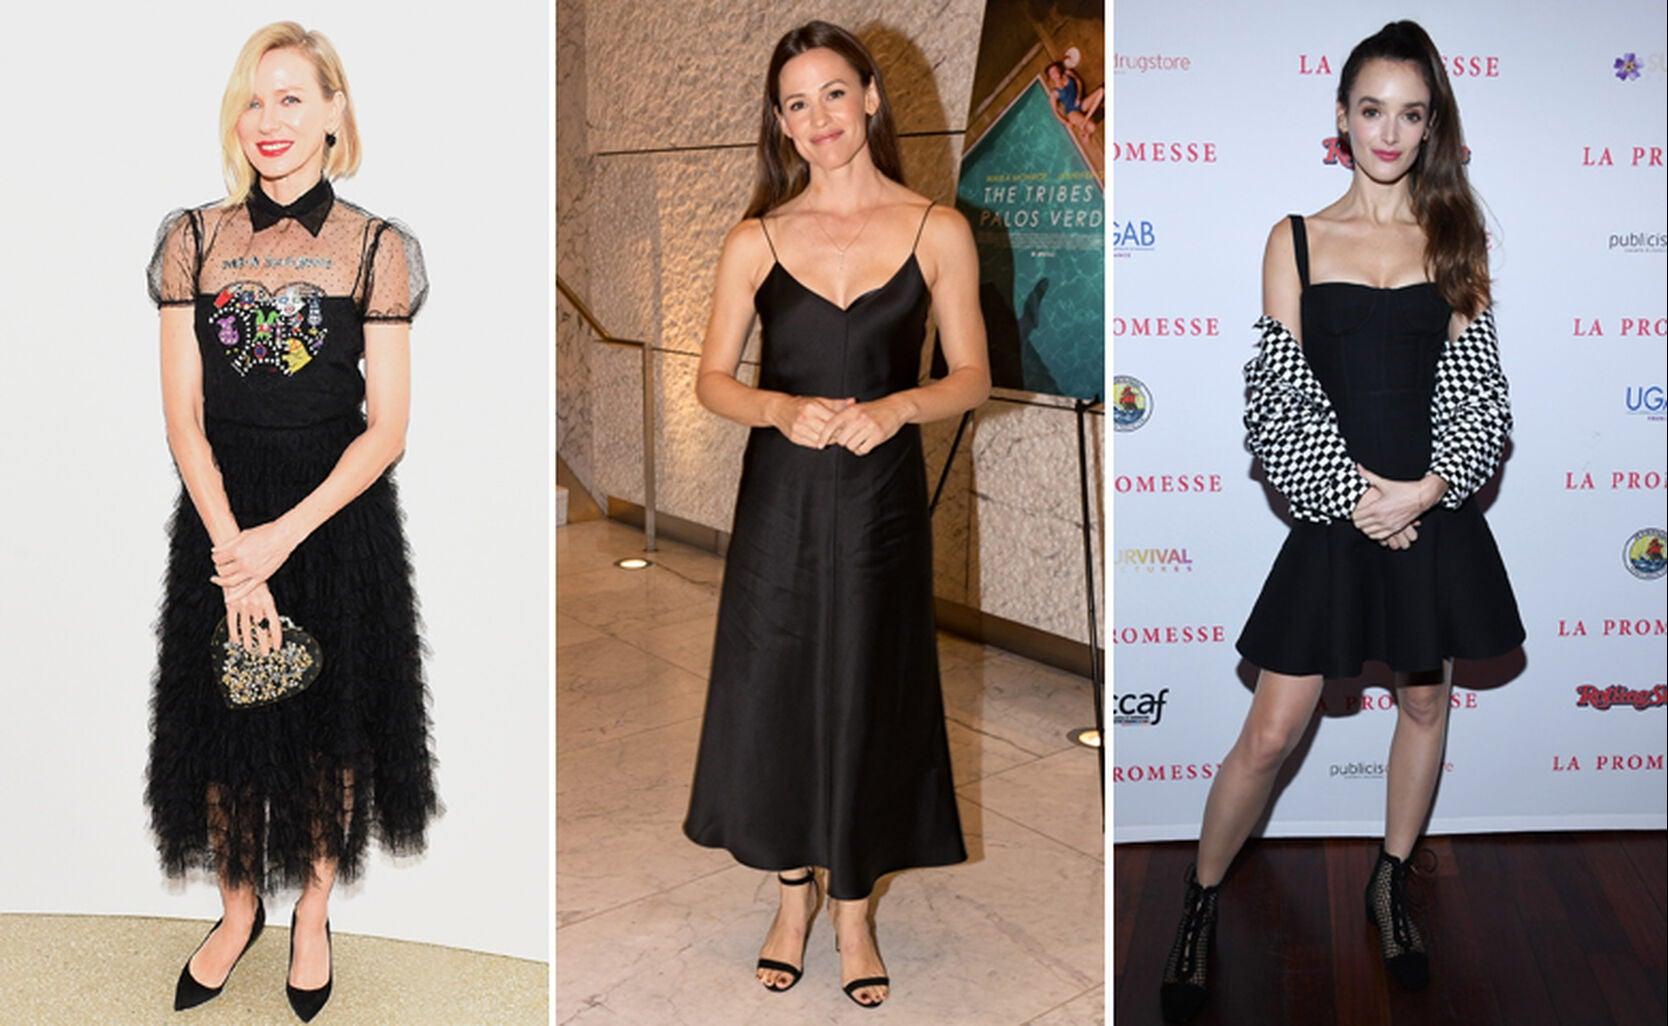 Naomi Watts, Jennifer Garner and Charlotte Le Bon